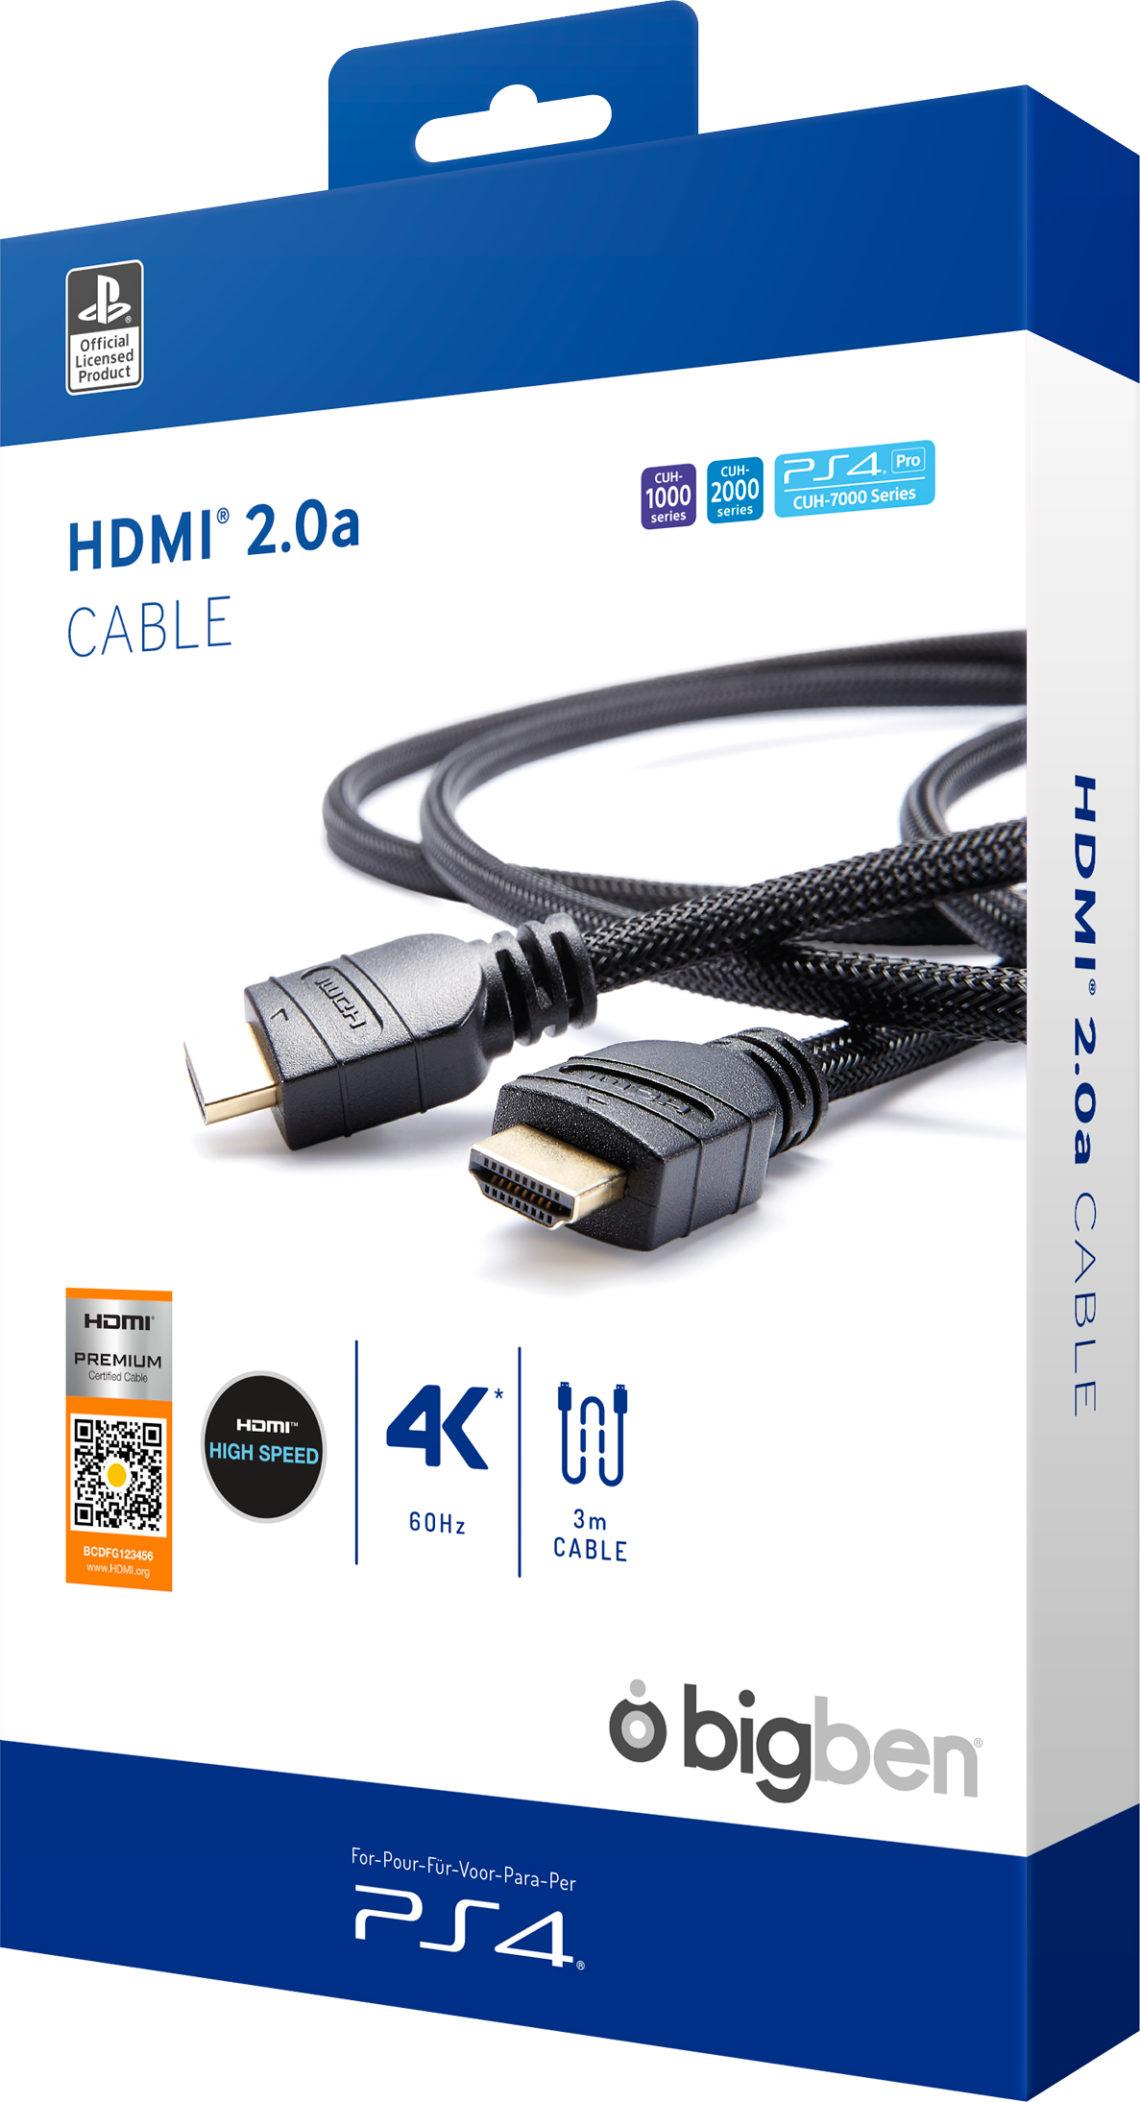 Sony HDMI CABLE HDMI® 2.0 para Playstation 4 Pro Licencia oficial - Imagen#2tutu#4tutu#6tutu